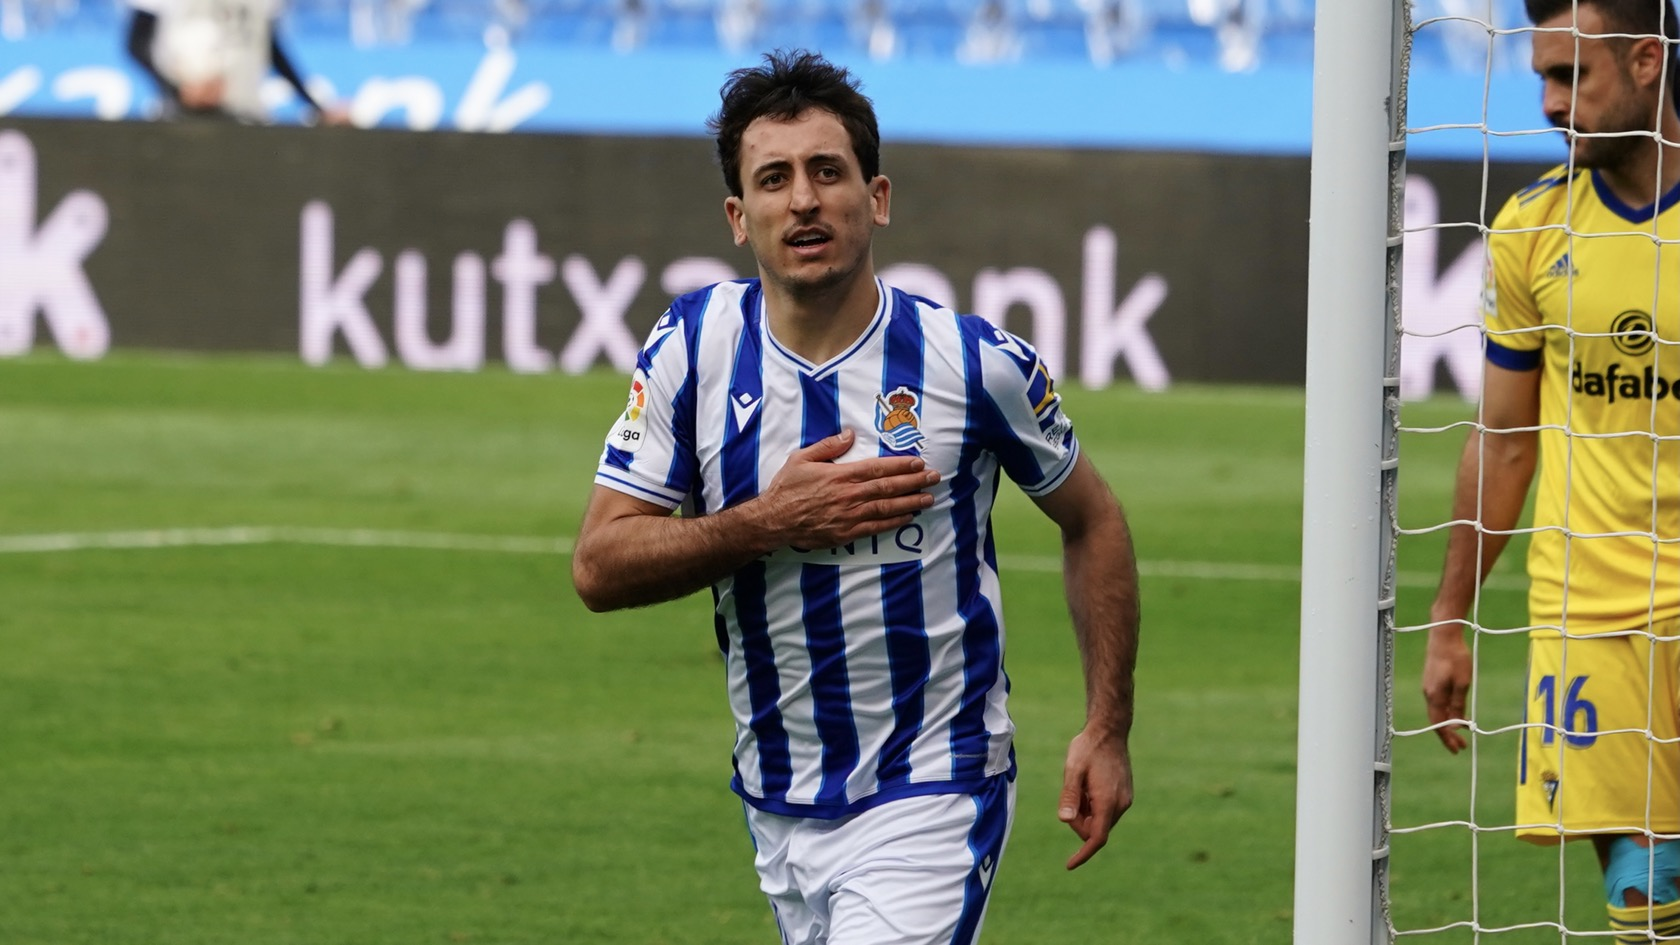 Real Sociedad secure dominant 4-1 win over Cadiz at Anoeta